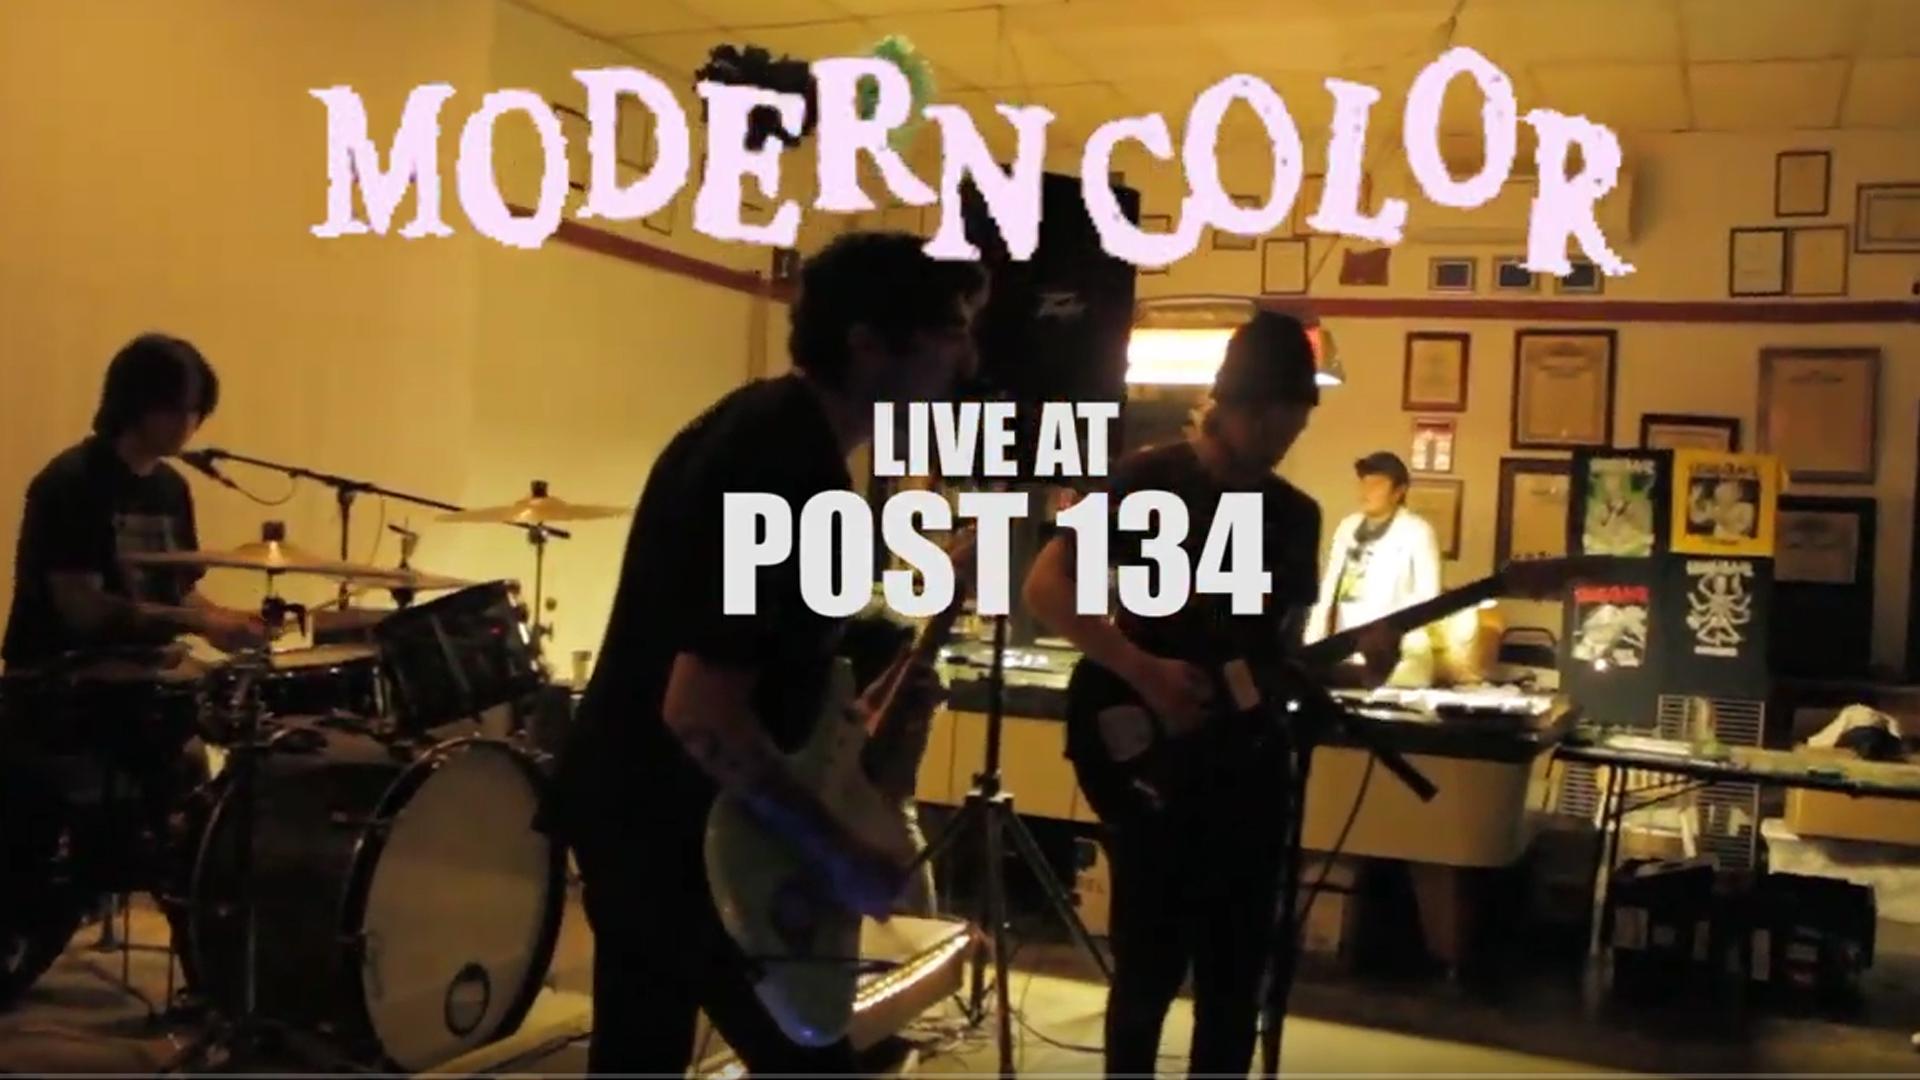 Modern Color.jpg